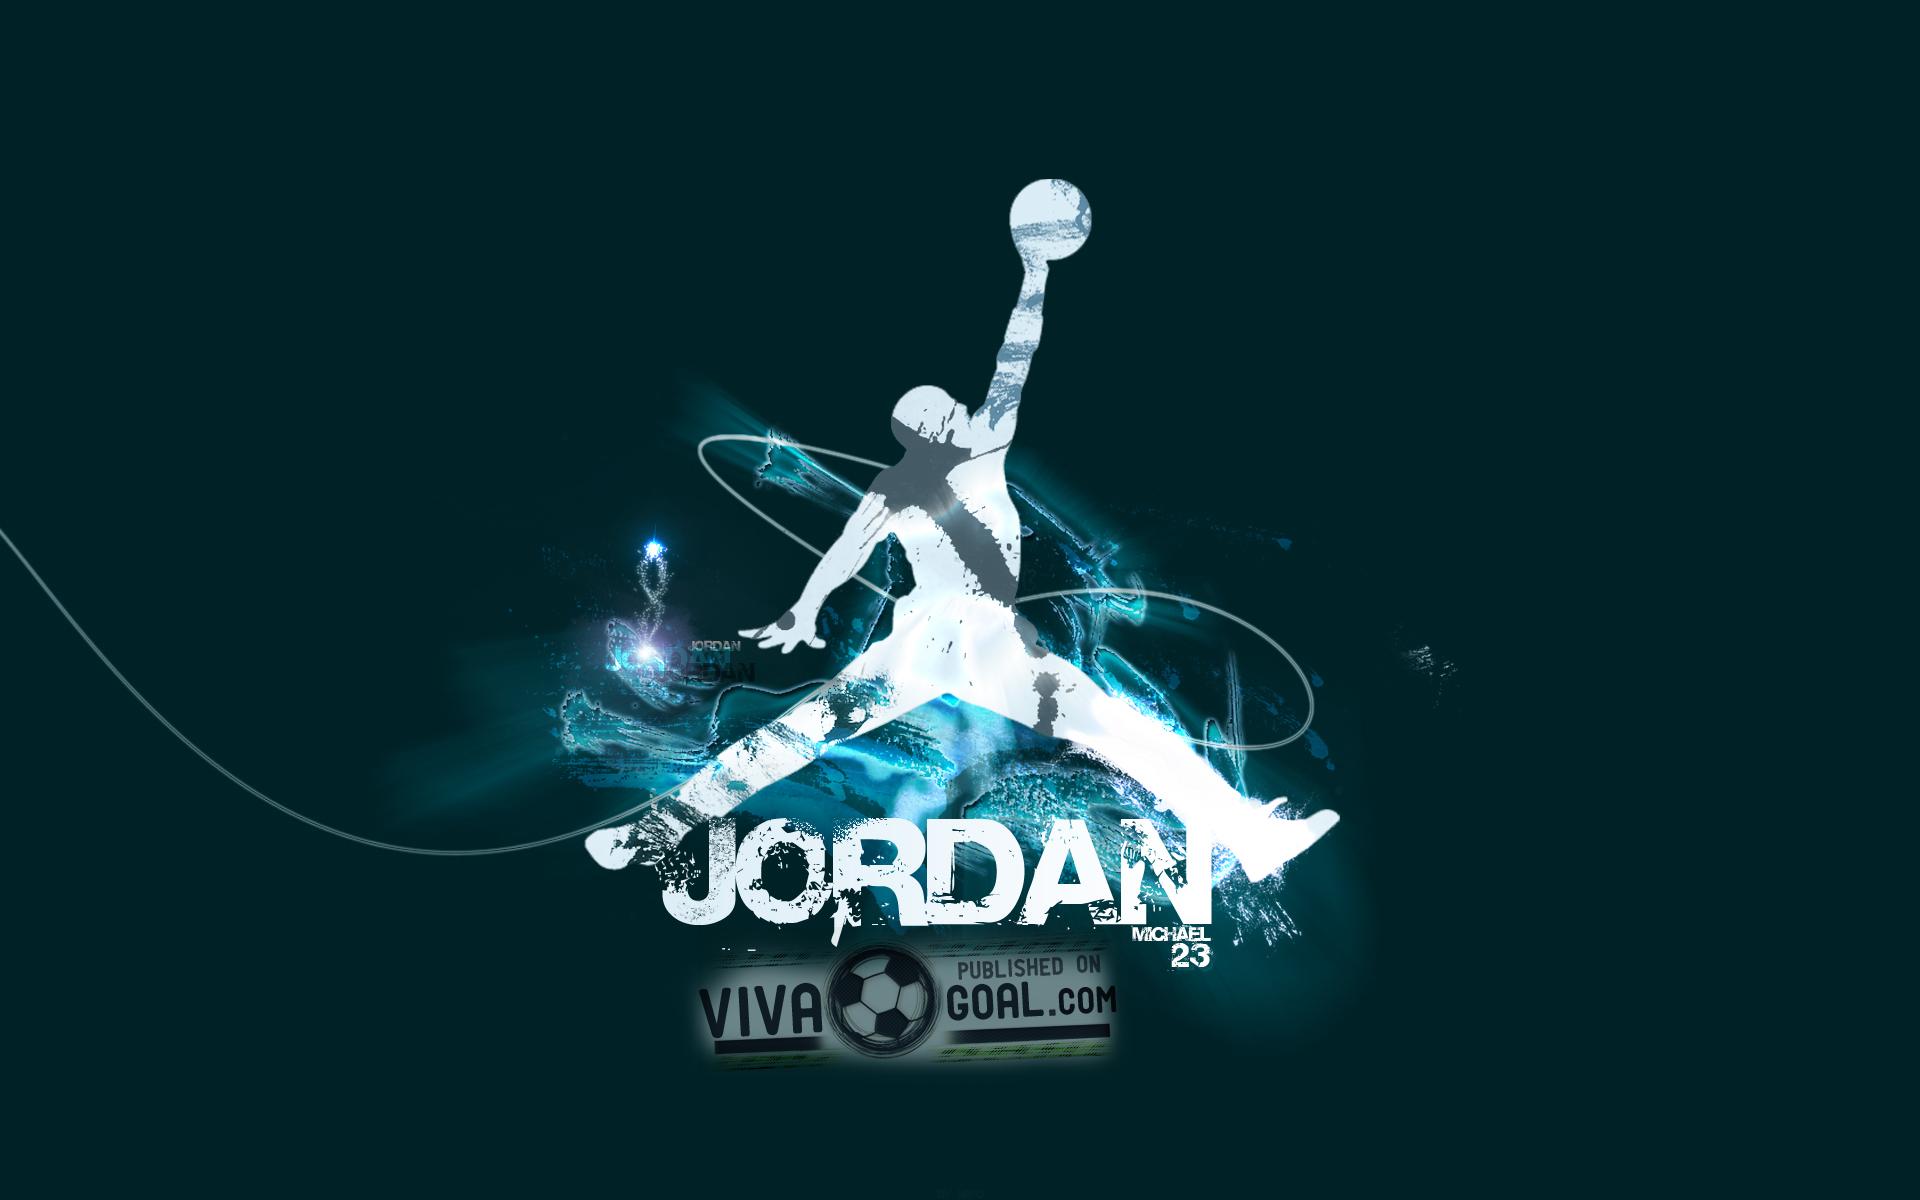 Michael Jordan hd wallpaper 1920x1200